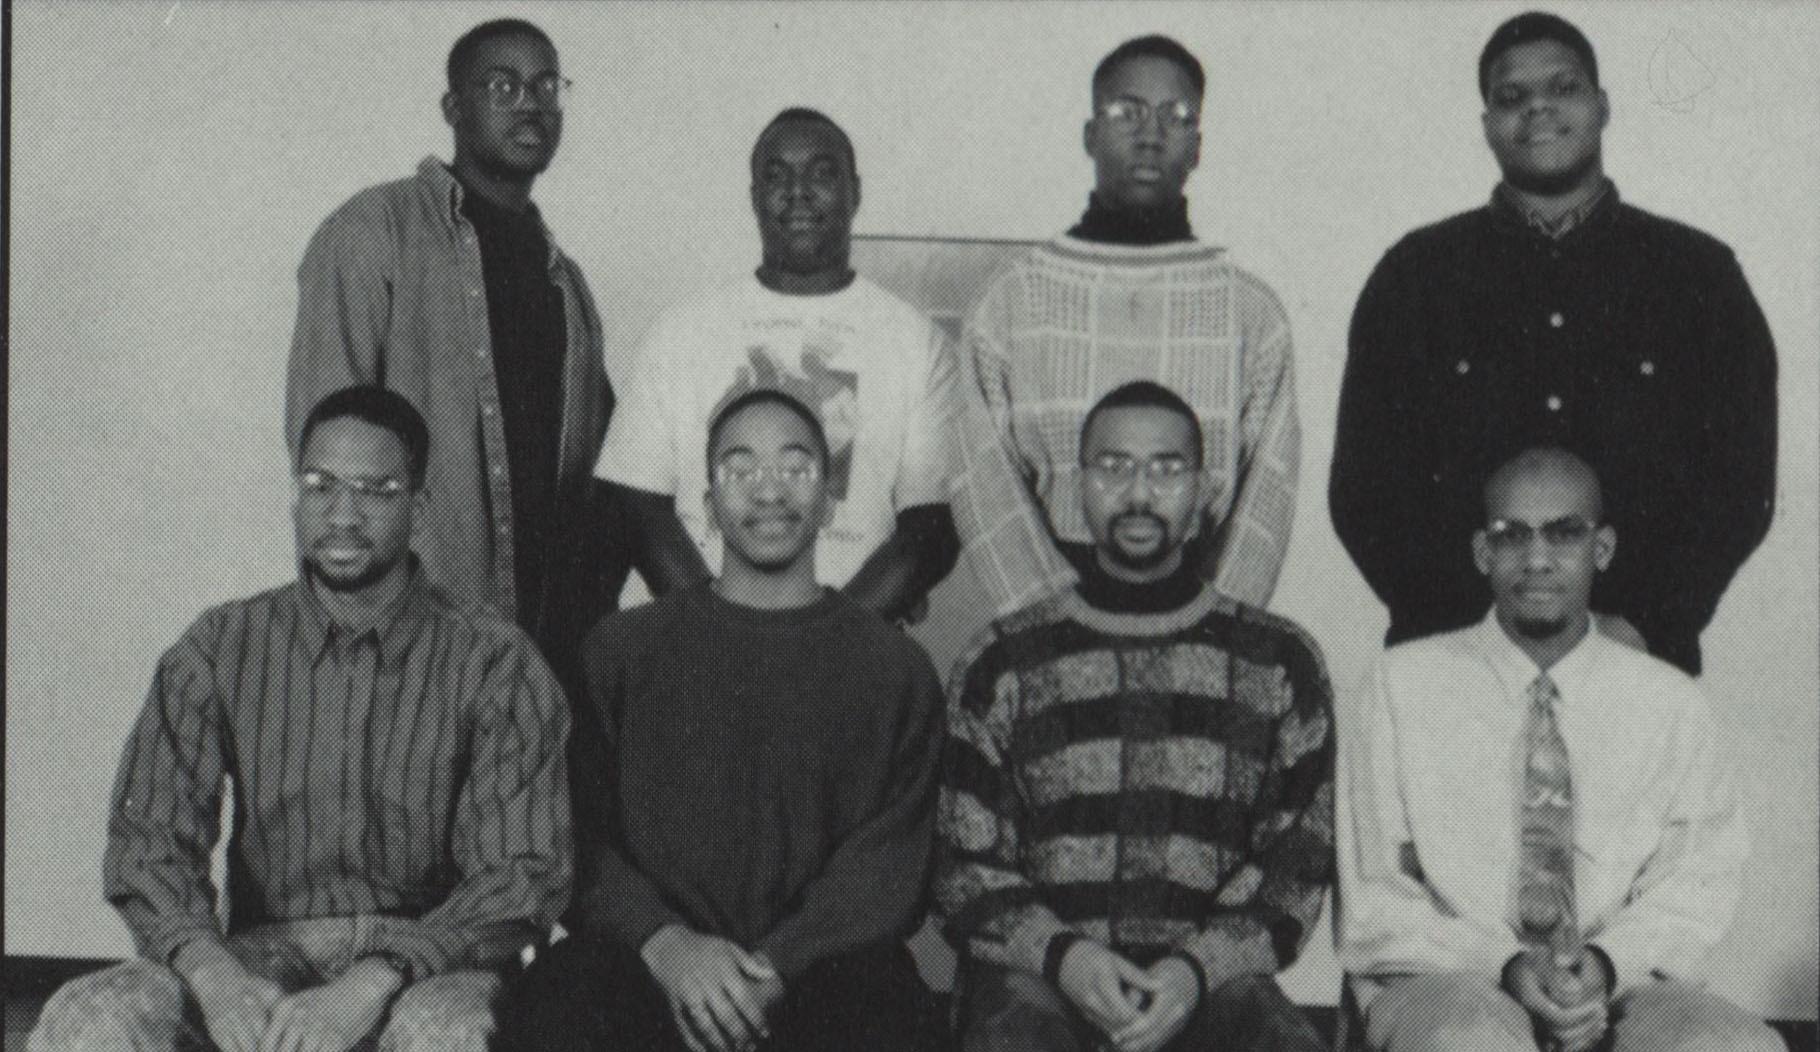 http://spec.lib.vt.edu/pickup/Omeka_upload/BlackMaleCoalition_1994.jpg